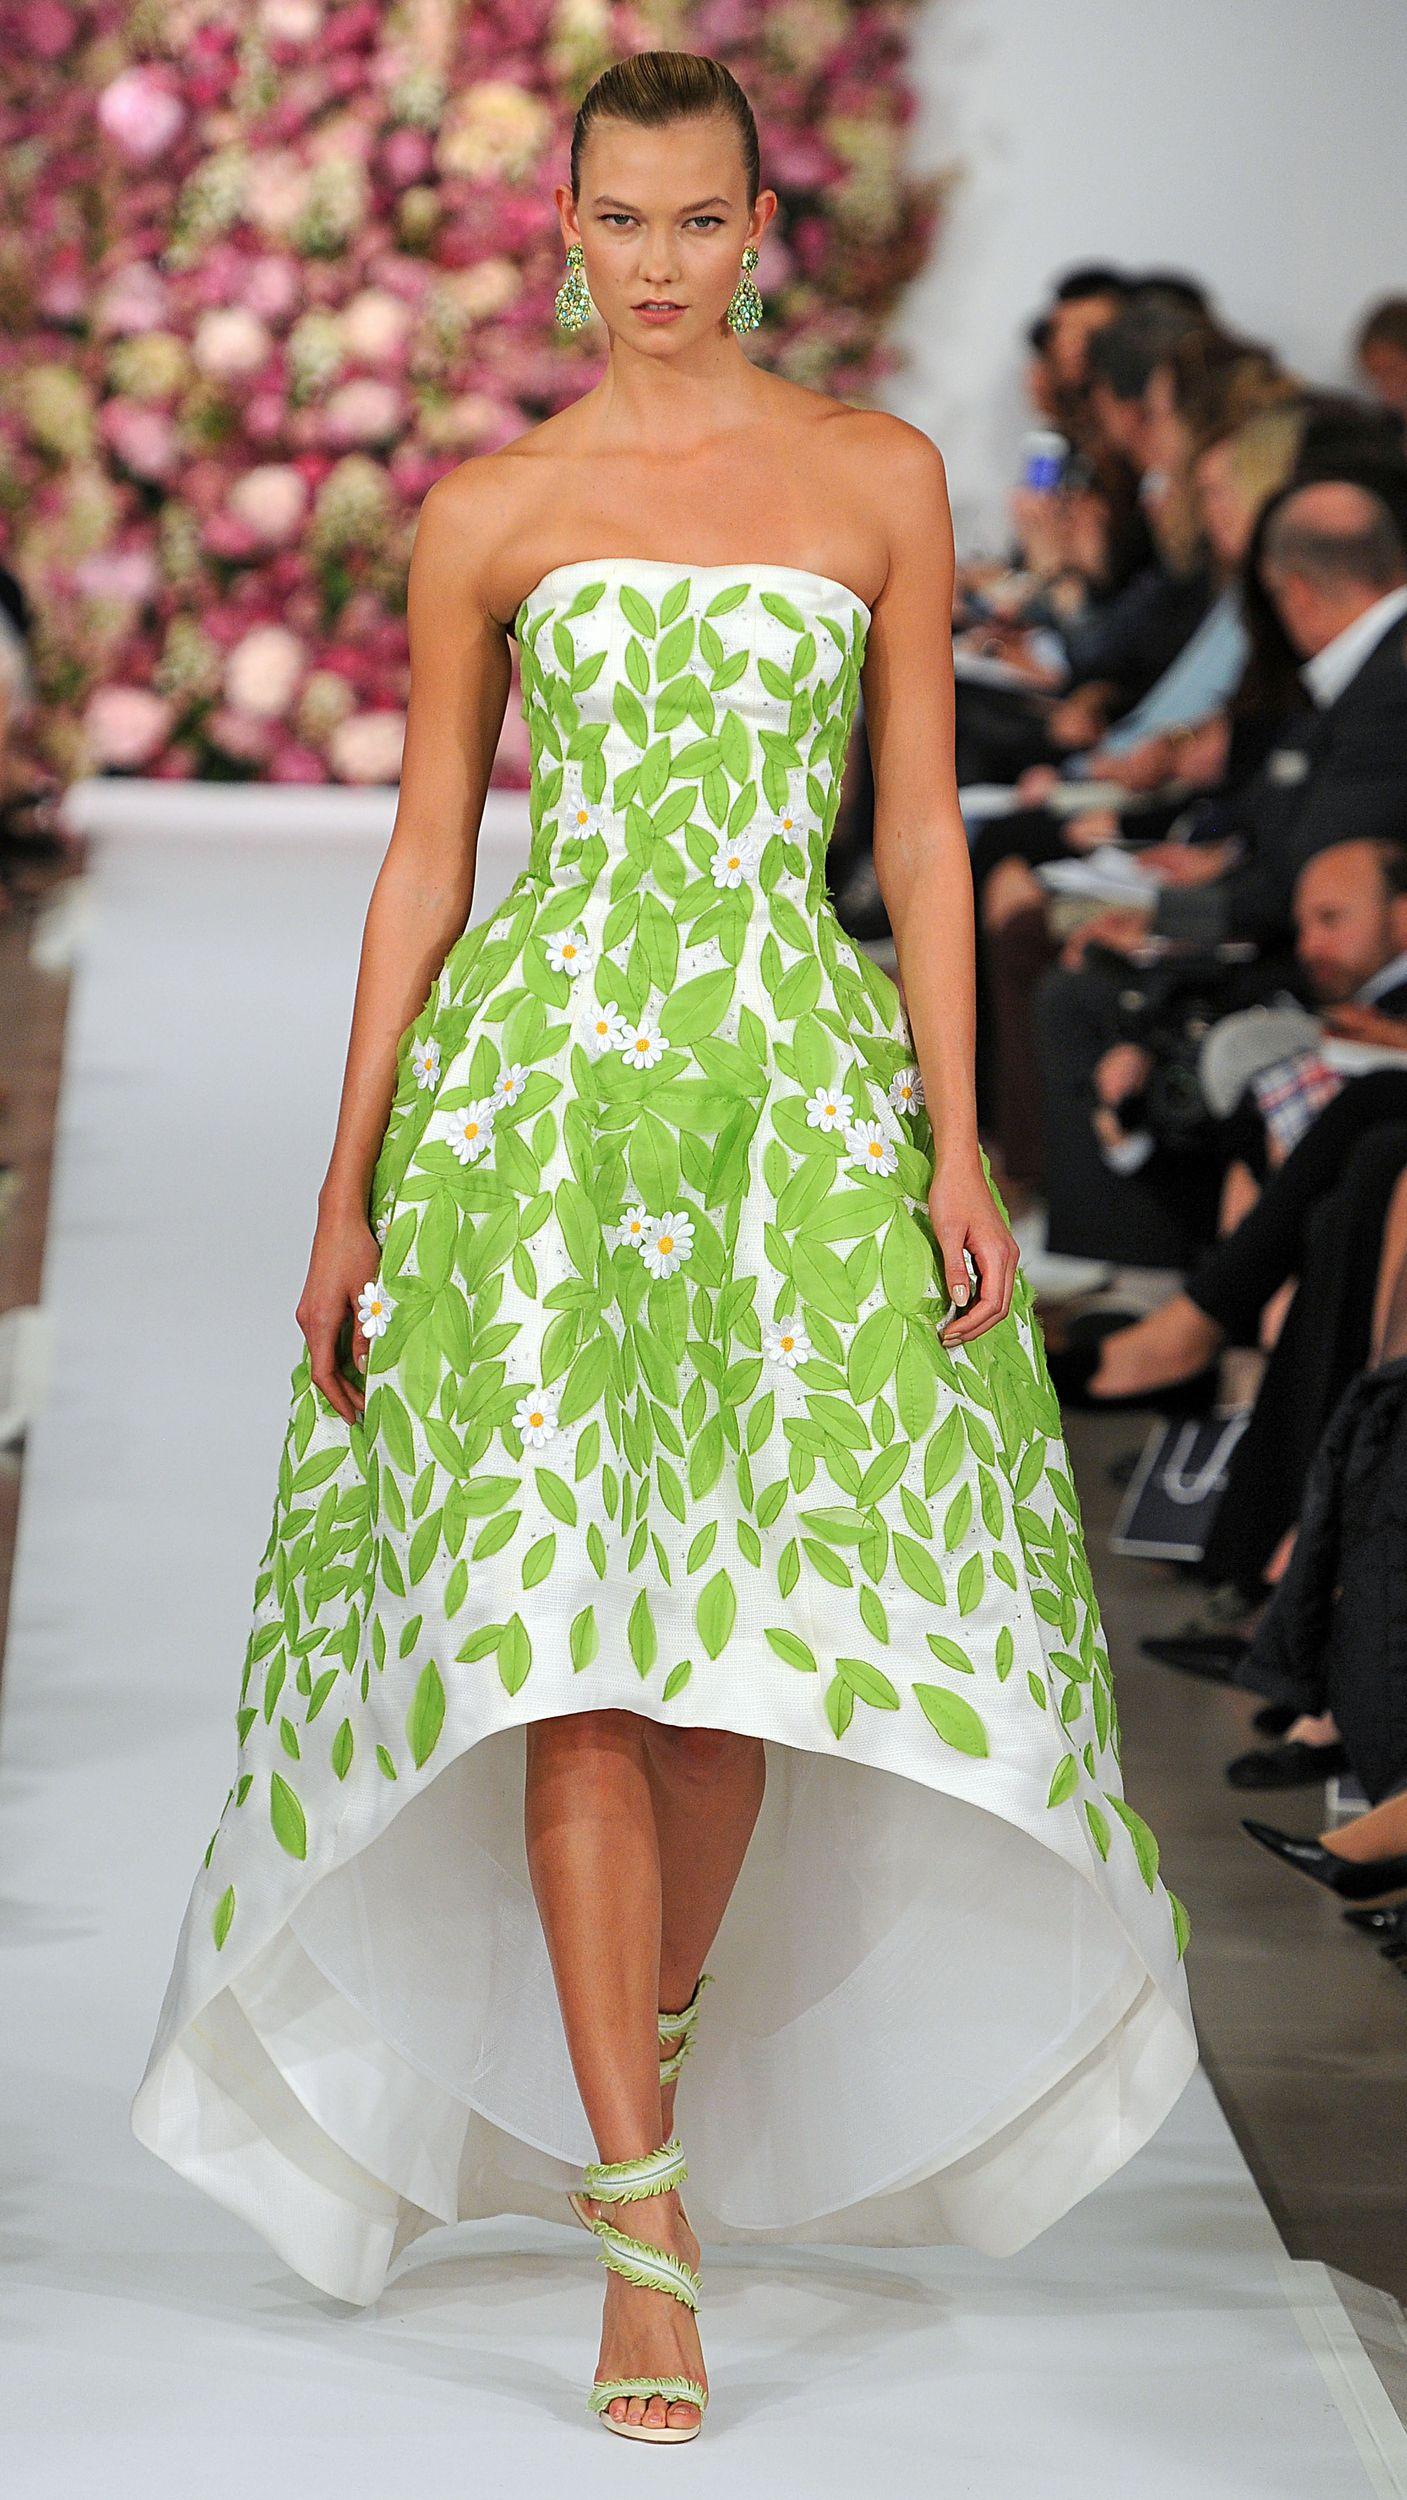 fb4a703c9901e0 Diva Mode, Couture Mode, Mode Design, Schöne Schuhe, Schöne Kleider,  Formelle